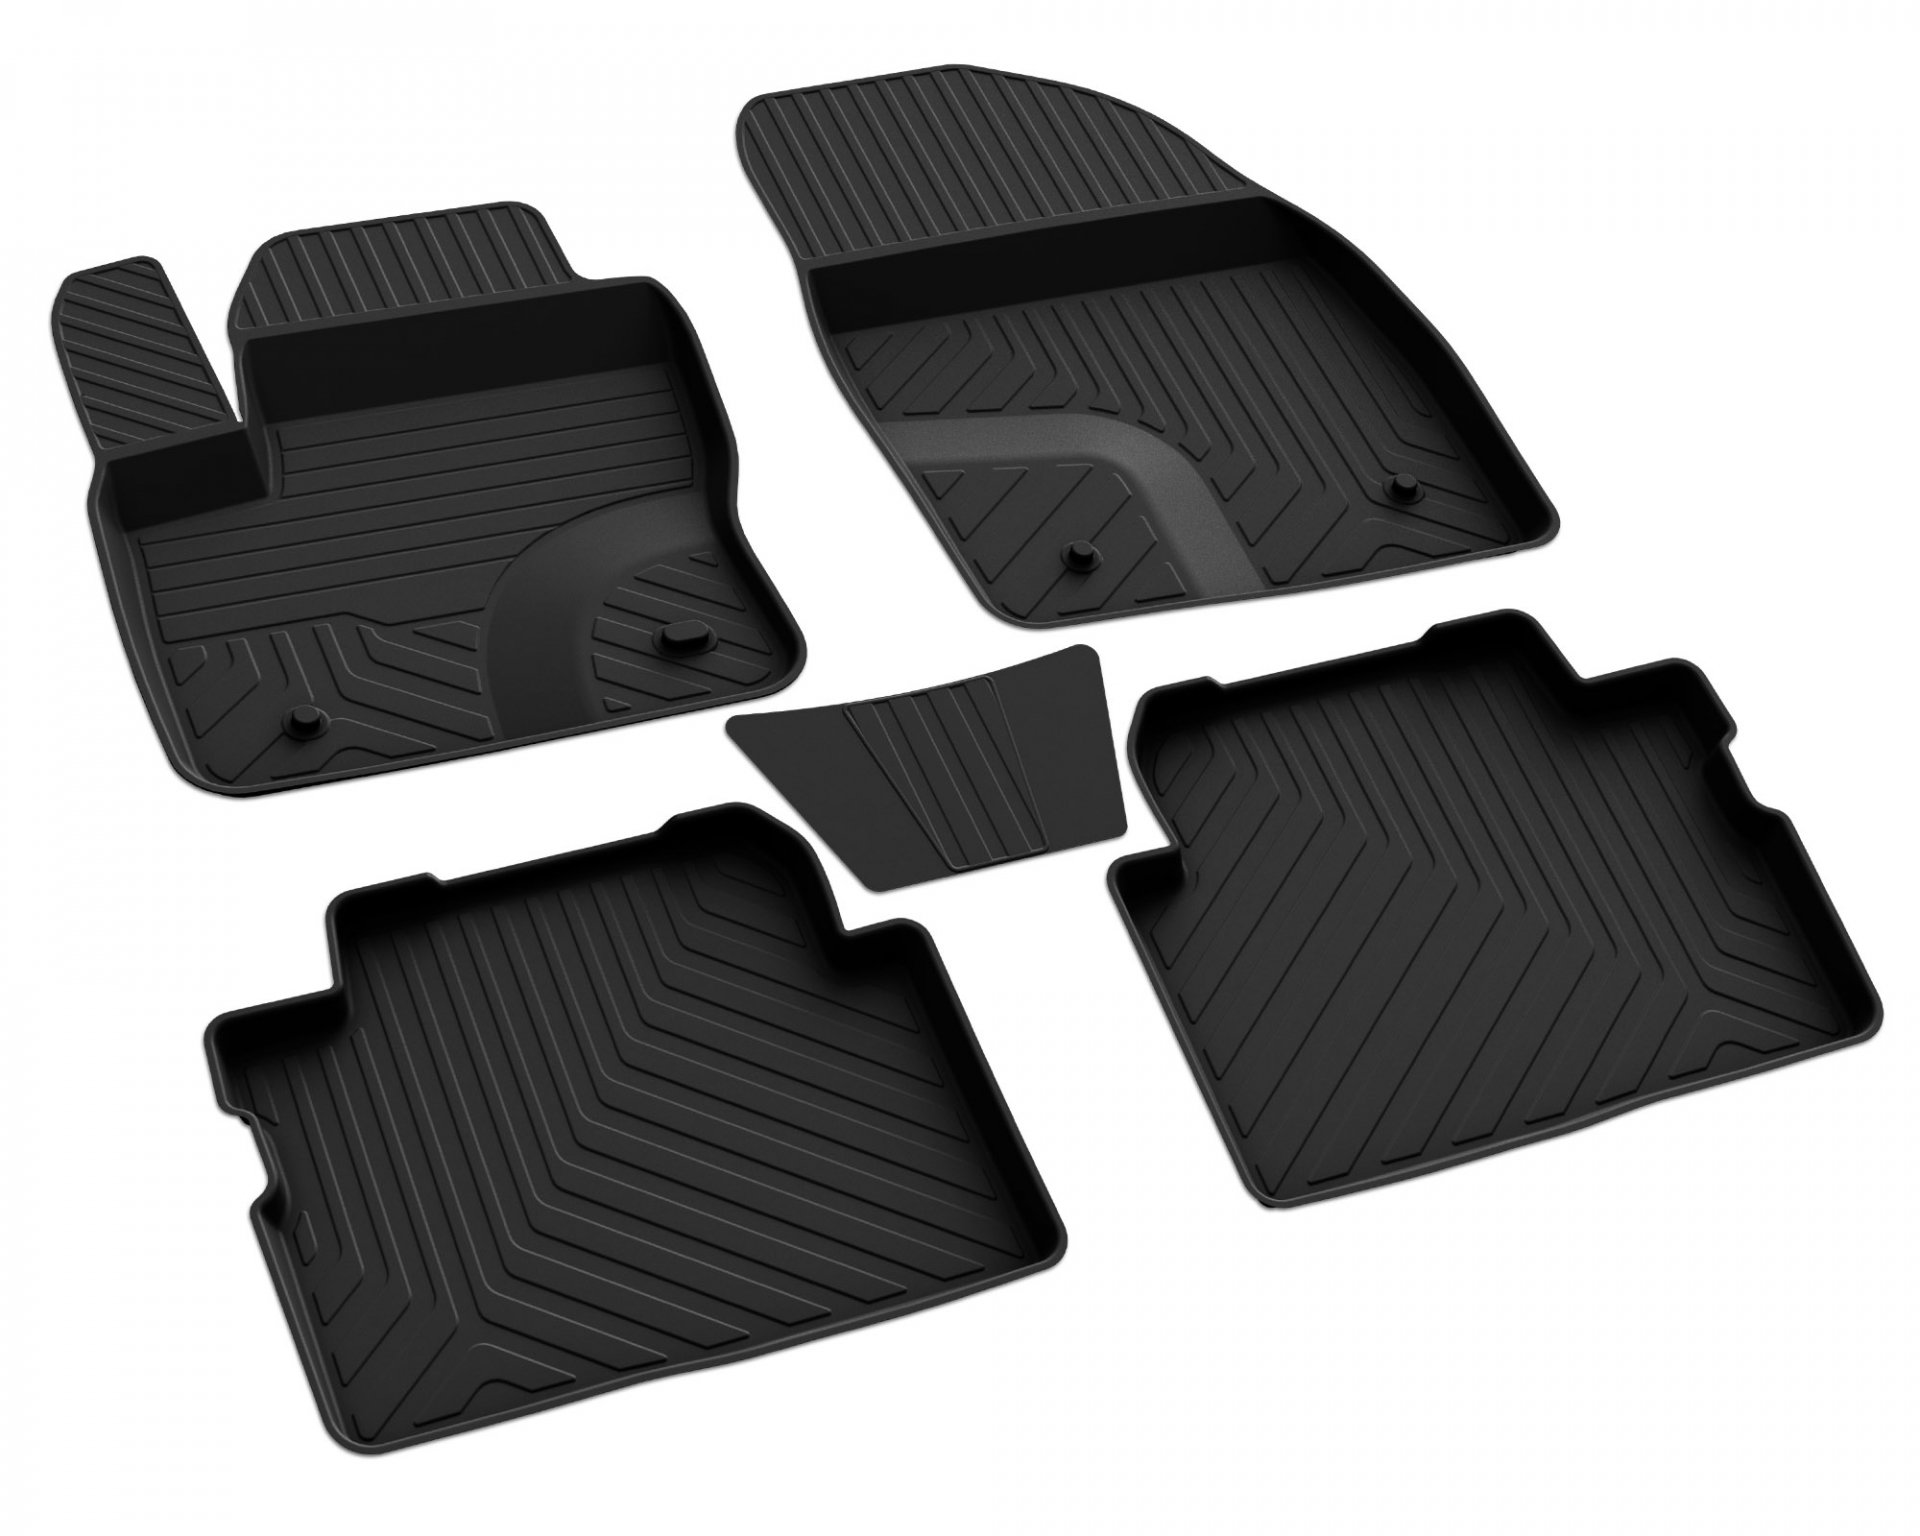 ford kuga 1 gen gummifussmatten set baujahr 2008 2012. Black Bedroom Furniture Sets. Home Design Ideas